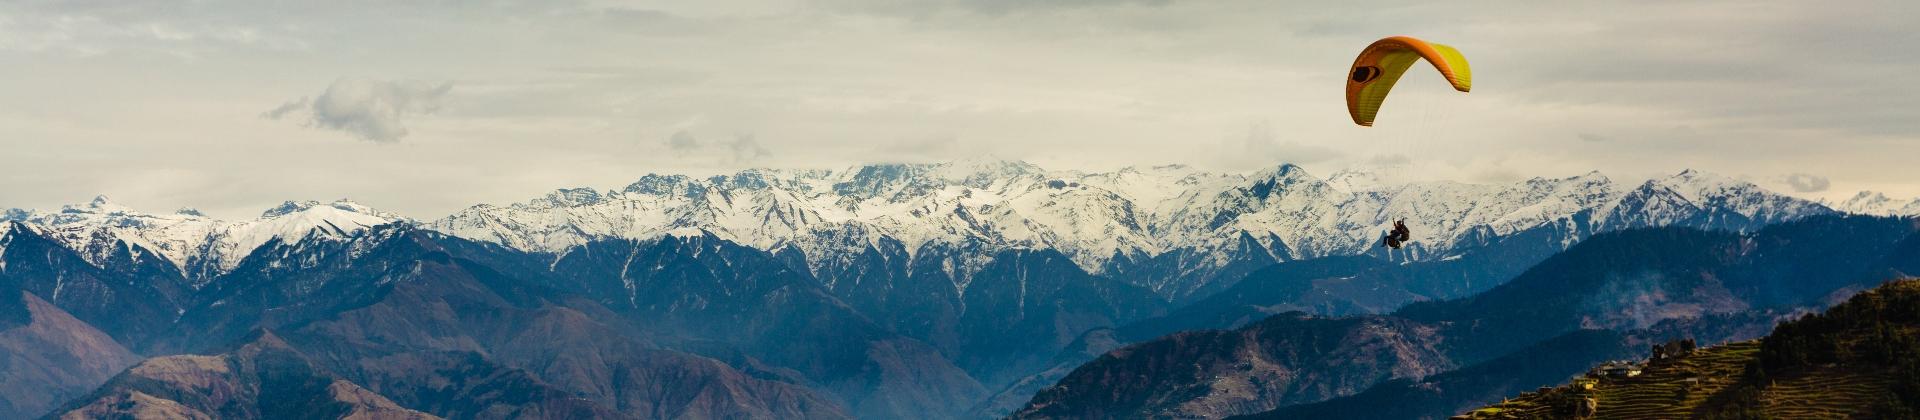 Bergketen in India